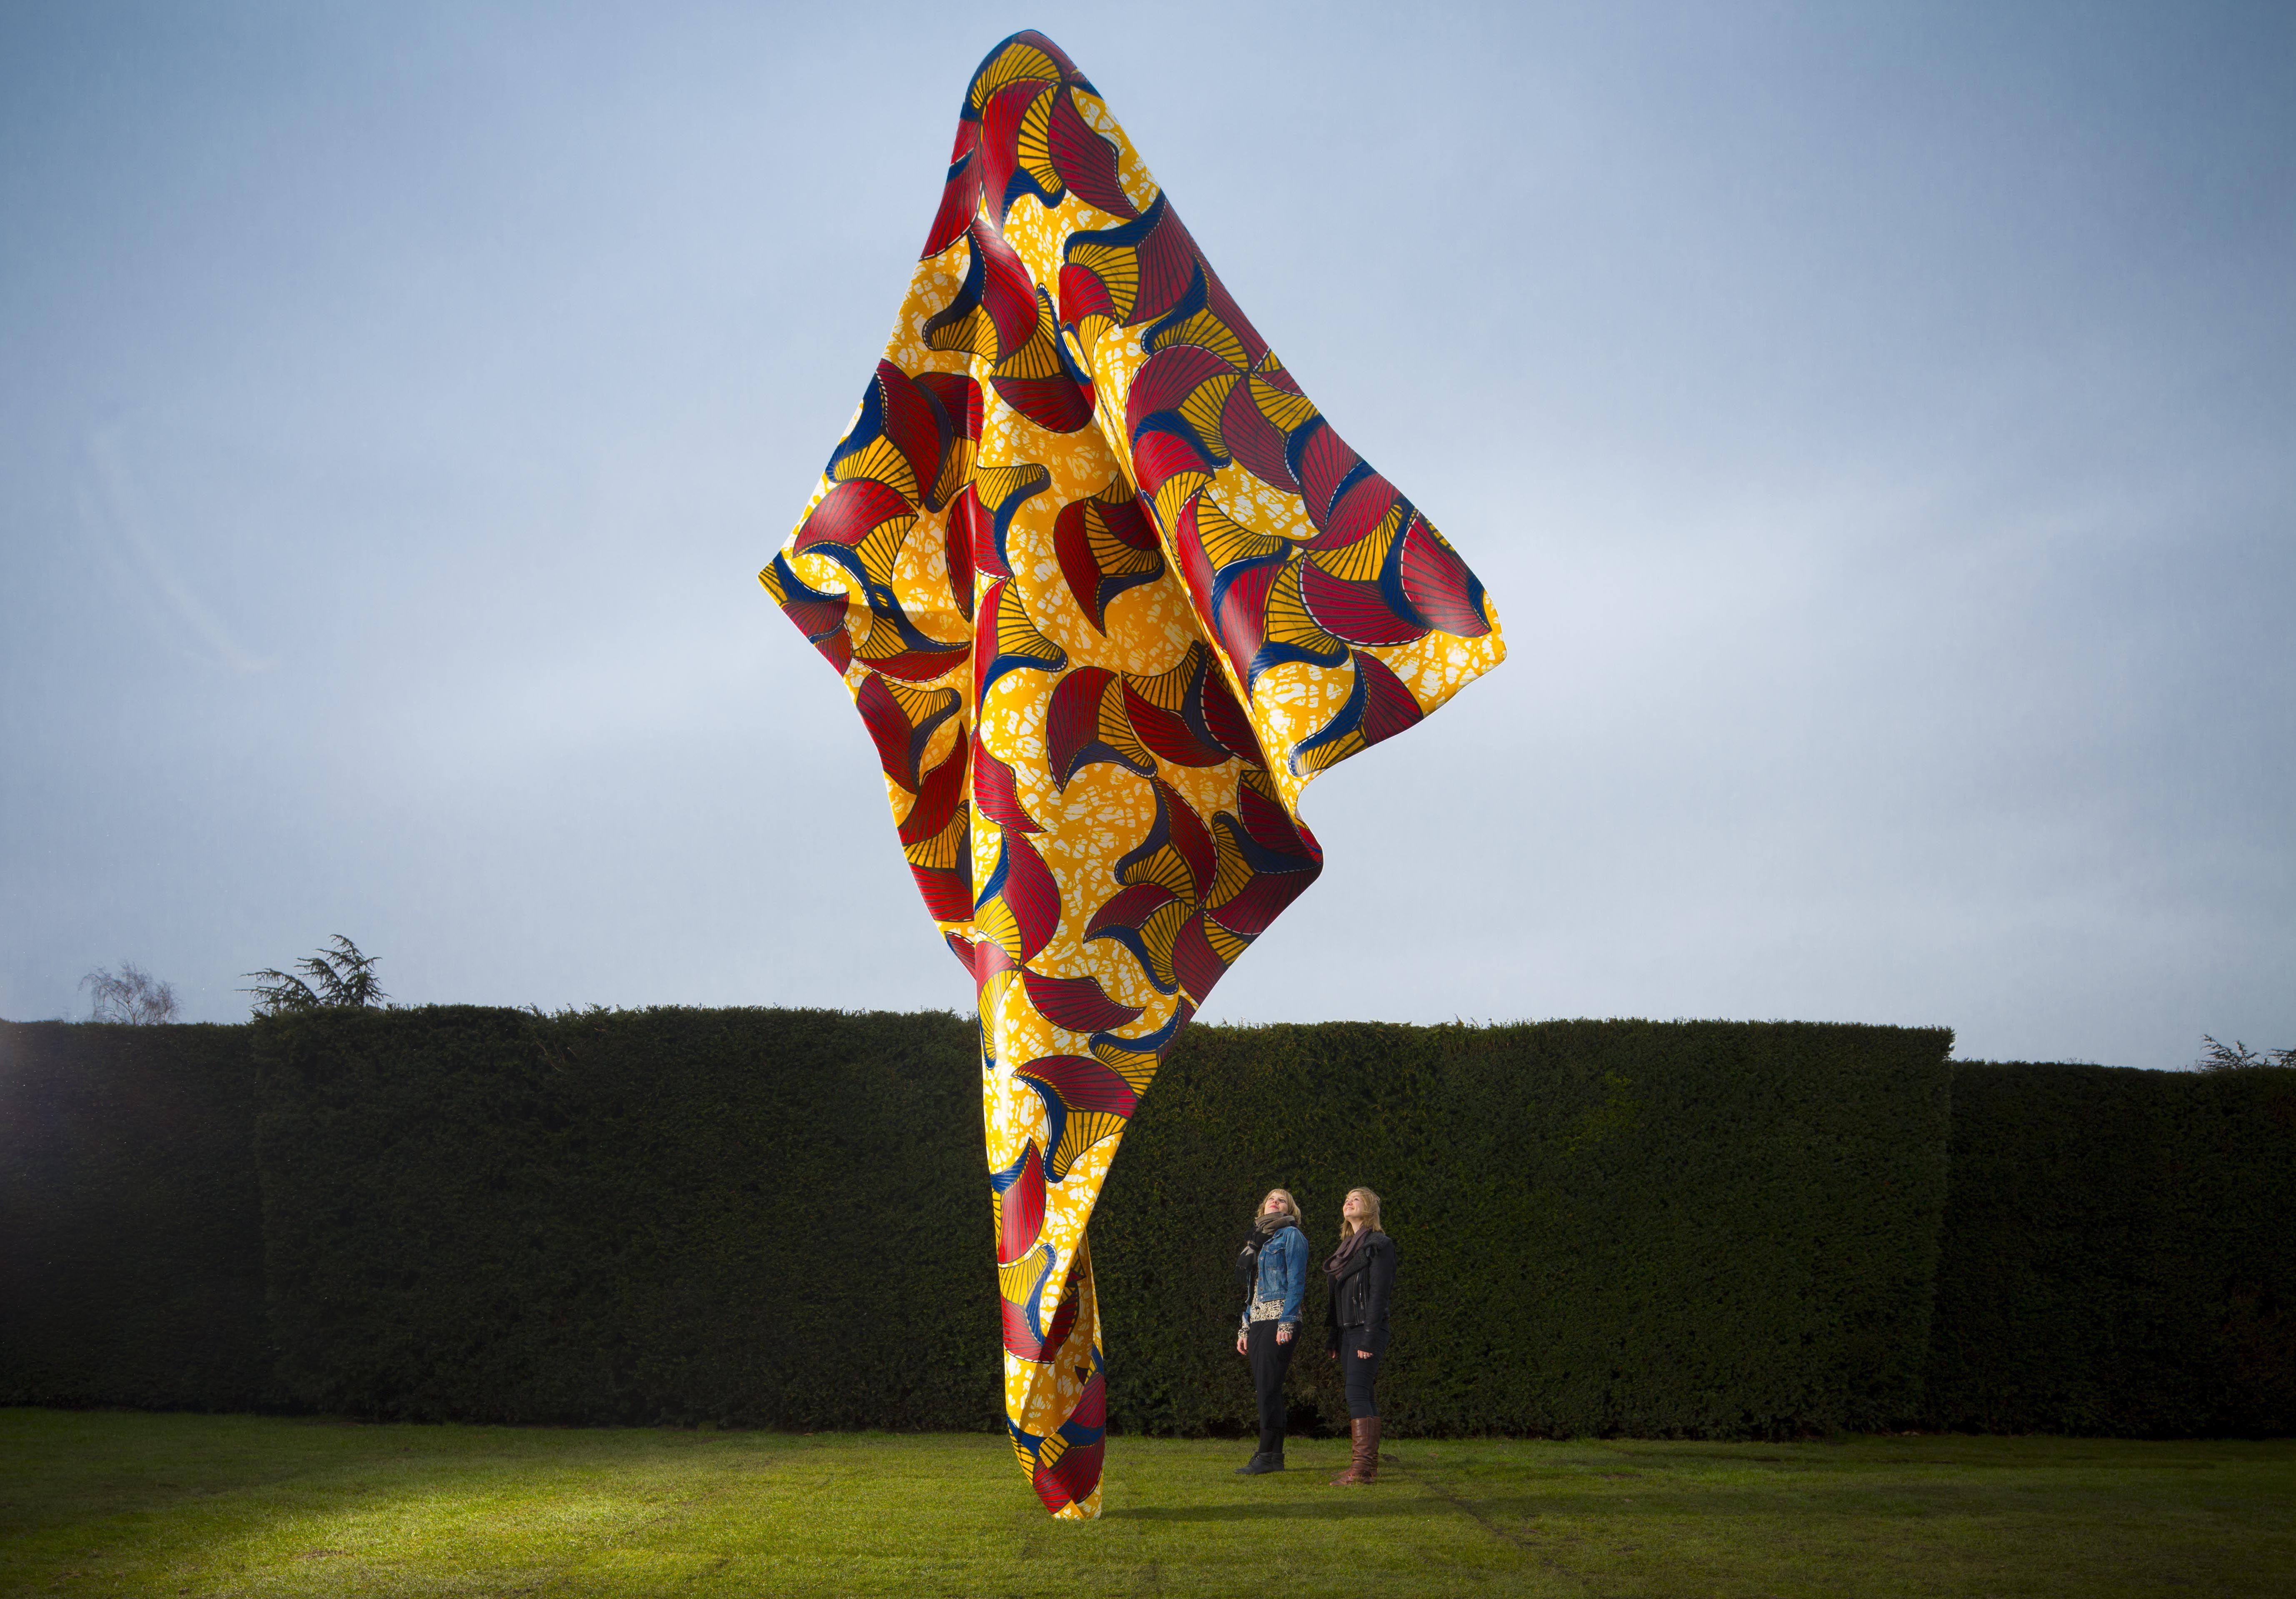 Related image Public sculpture, Public art, Wind sculptures